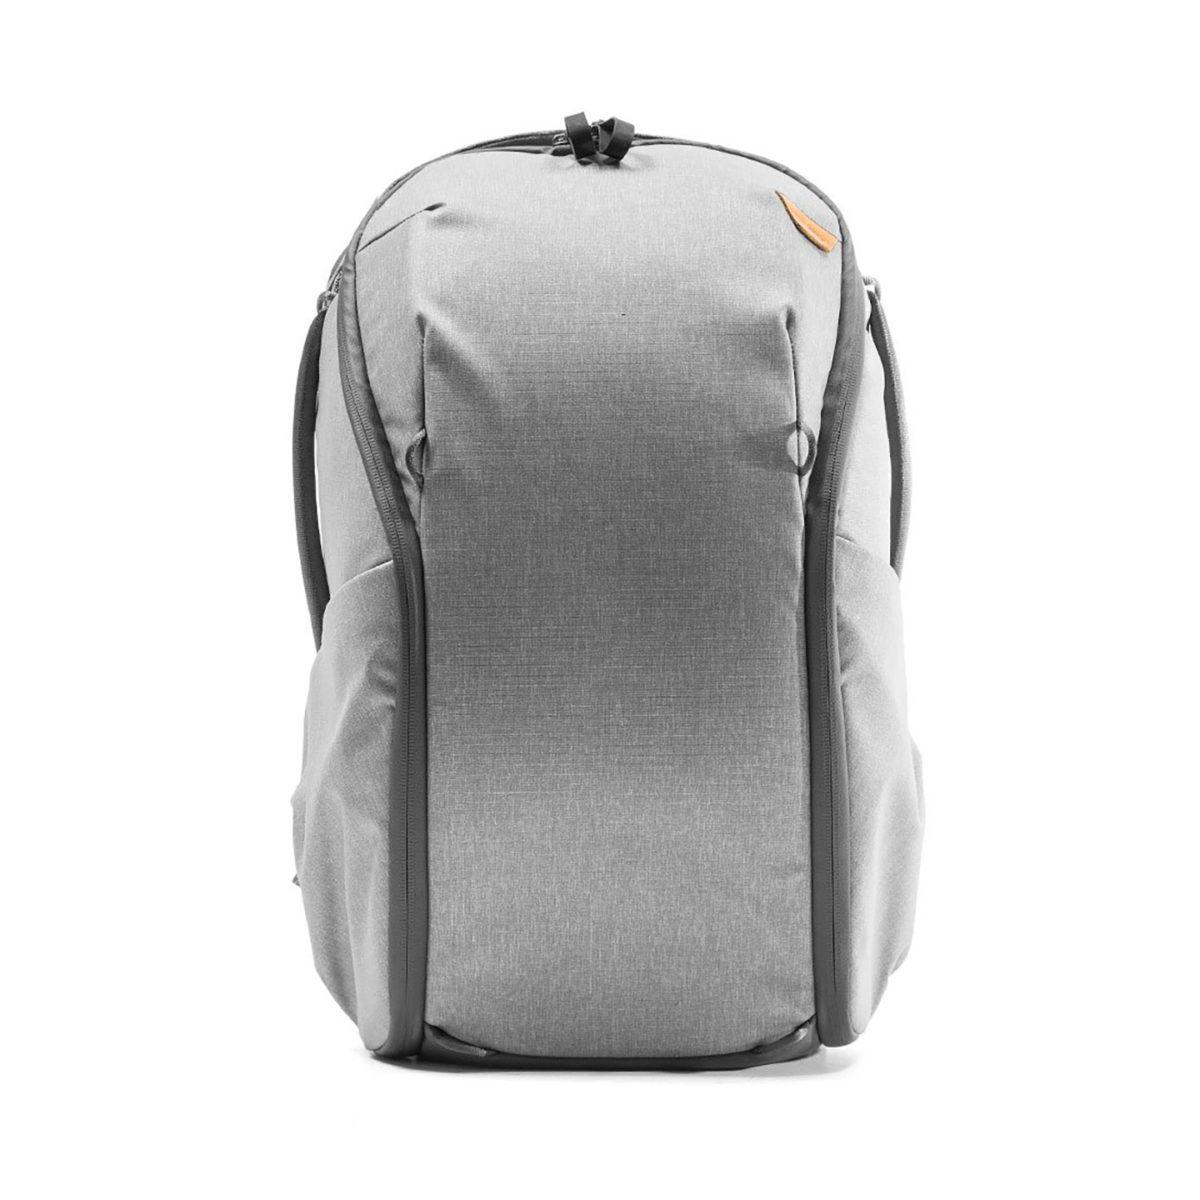 peak_design_everyday_backpack_zip_v2_20l_as_01